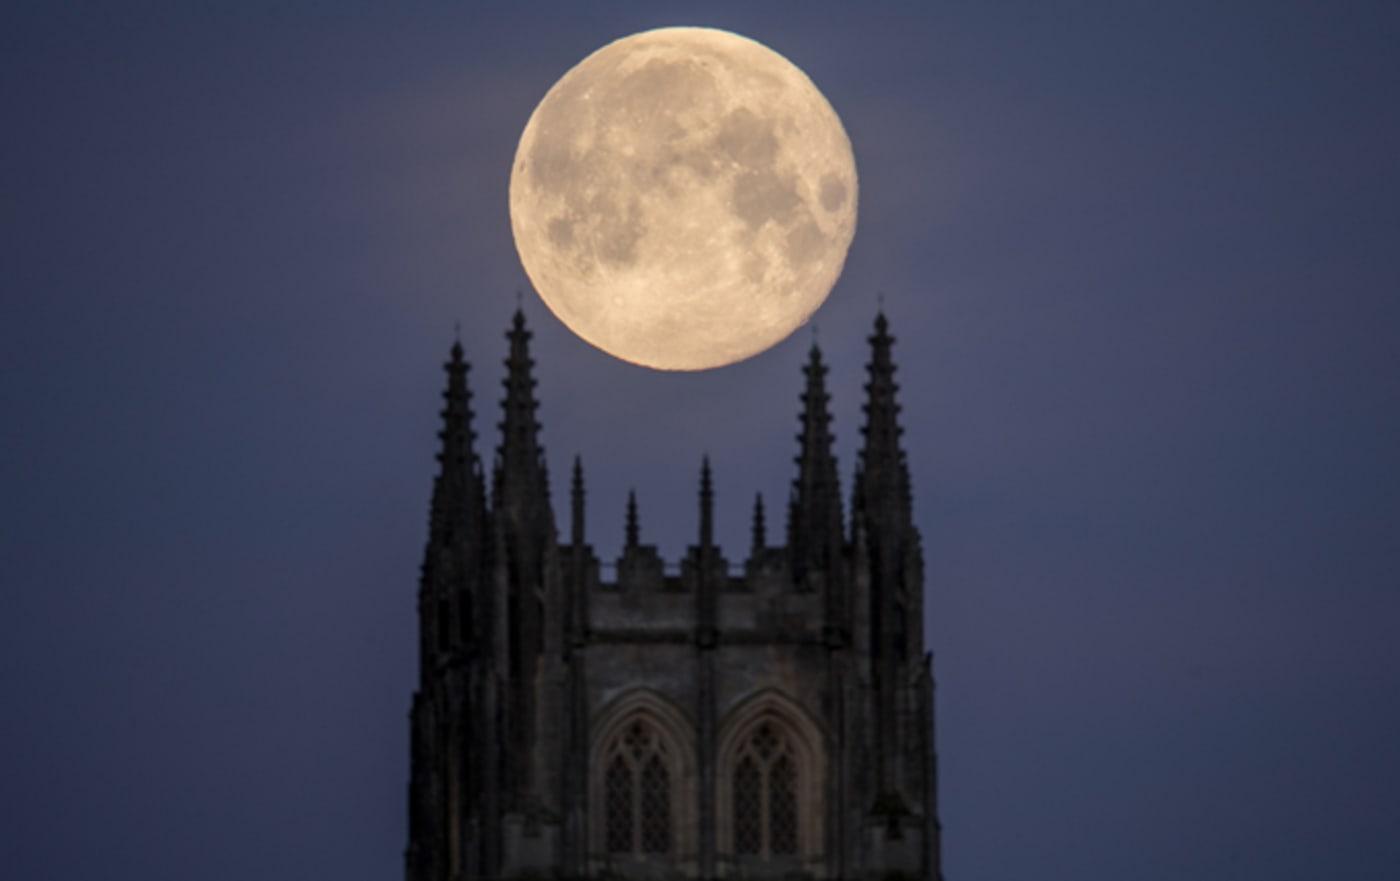 A Super Blue Blood Moon sets behind Downside Abbey